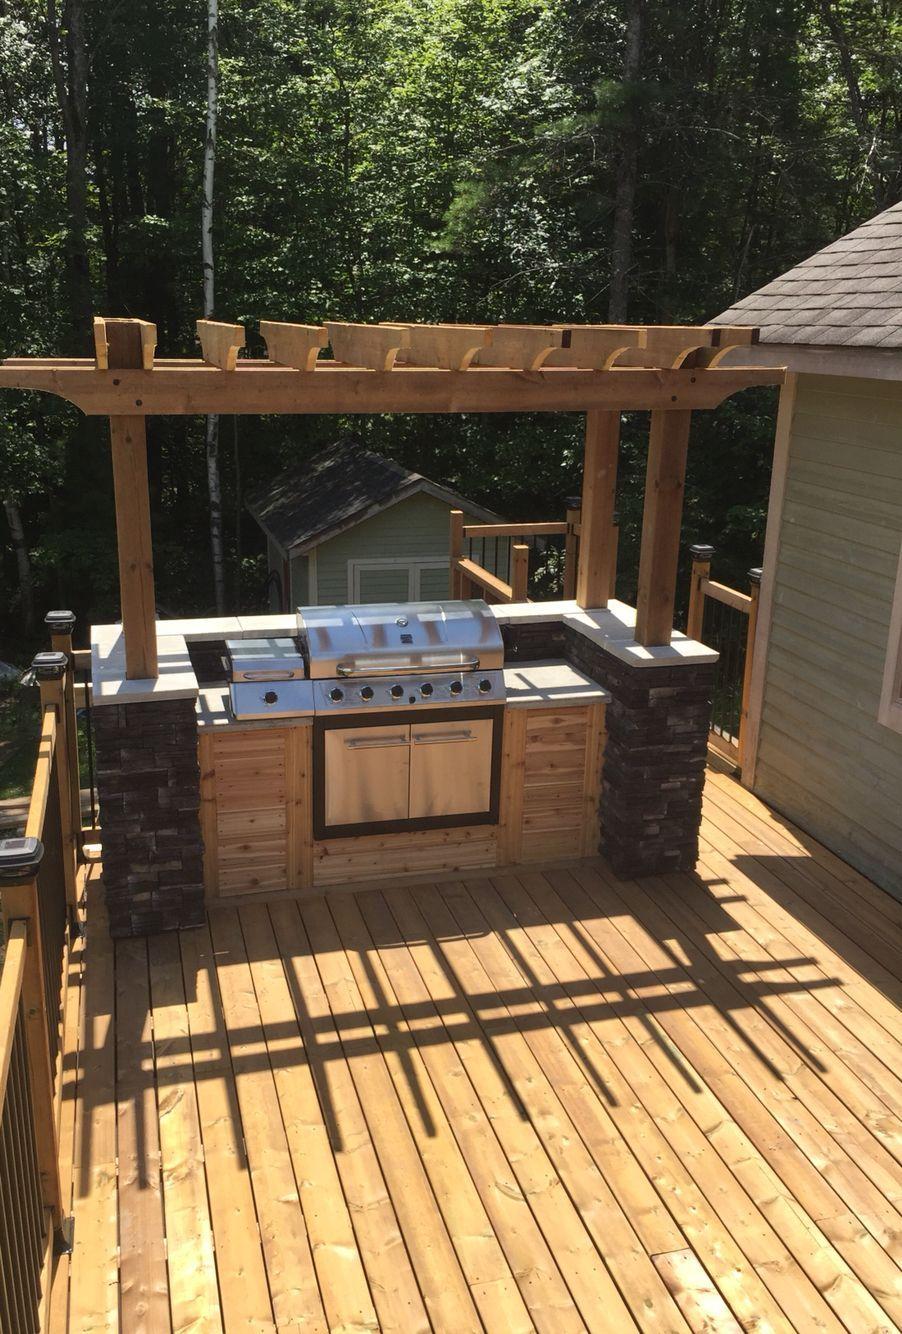 7 outdoor kitchen ideas for the best summer yet